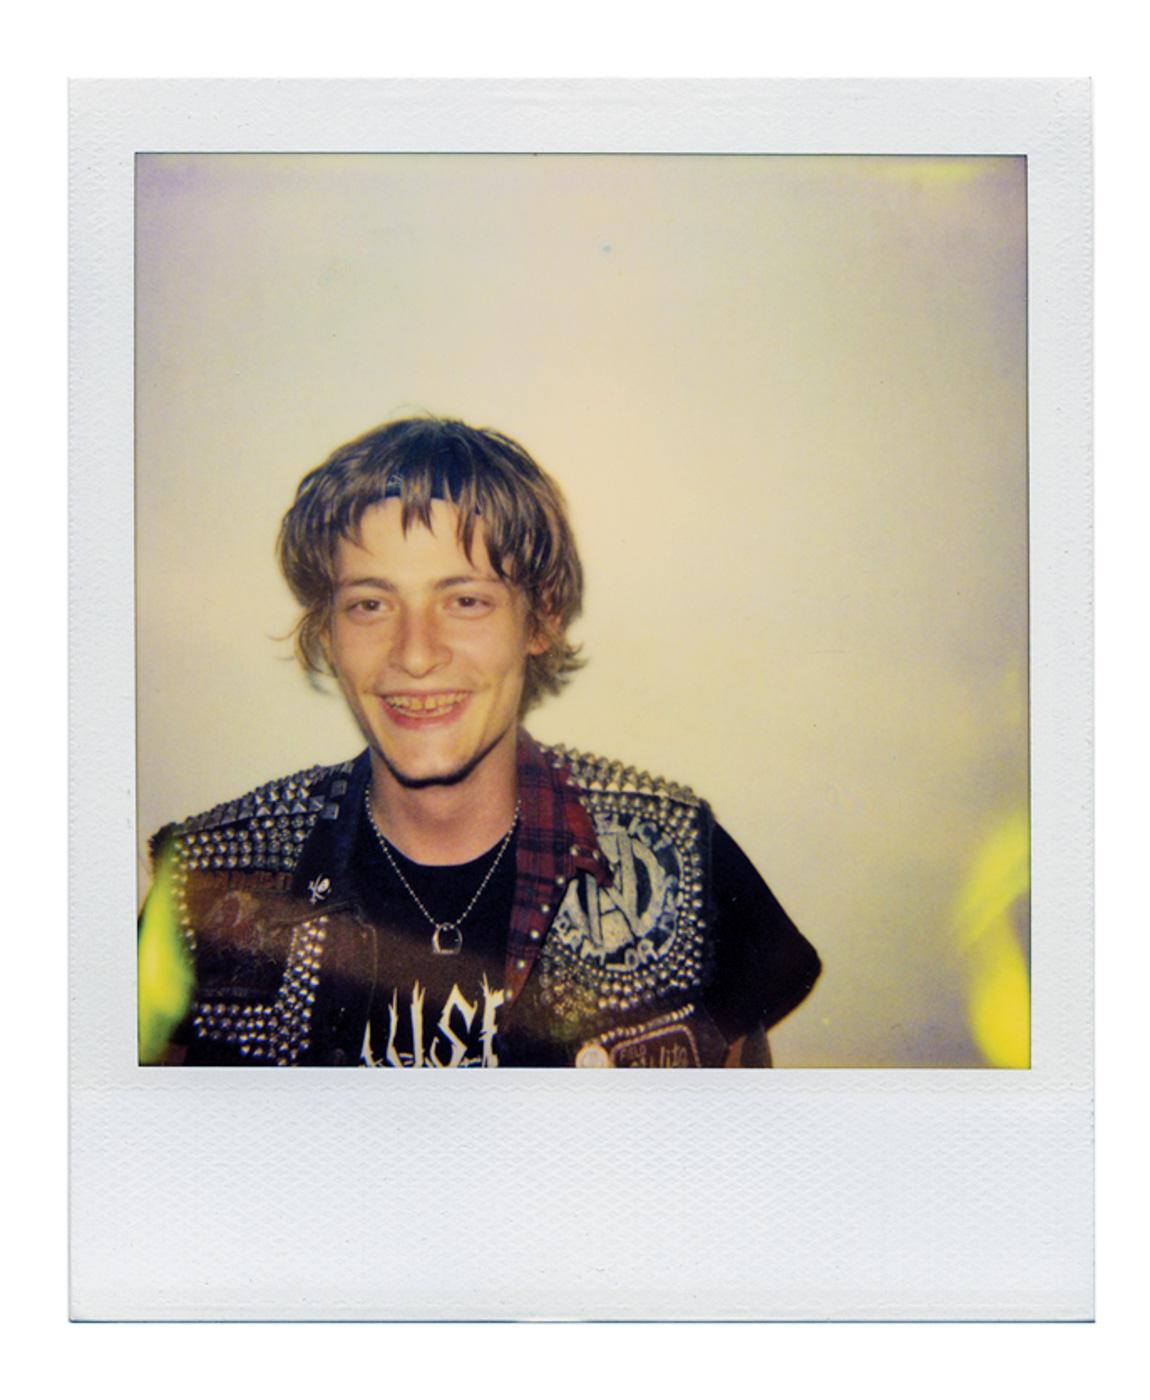 Jake, 2002